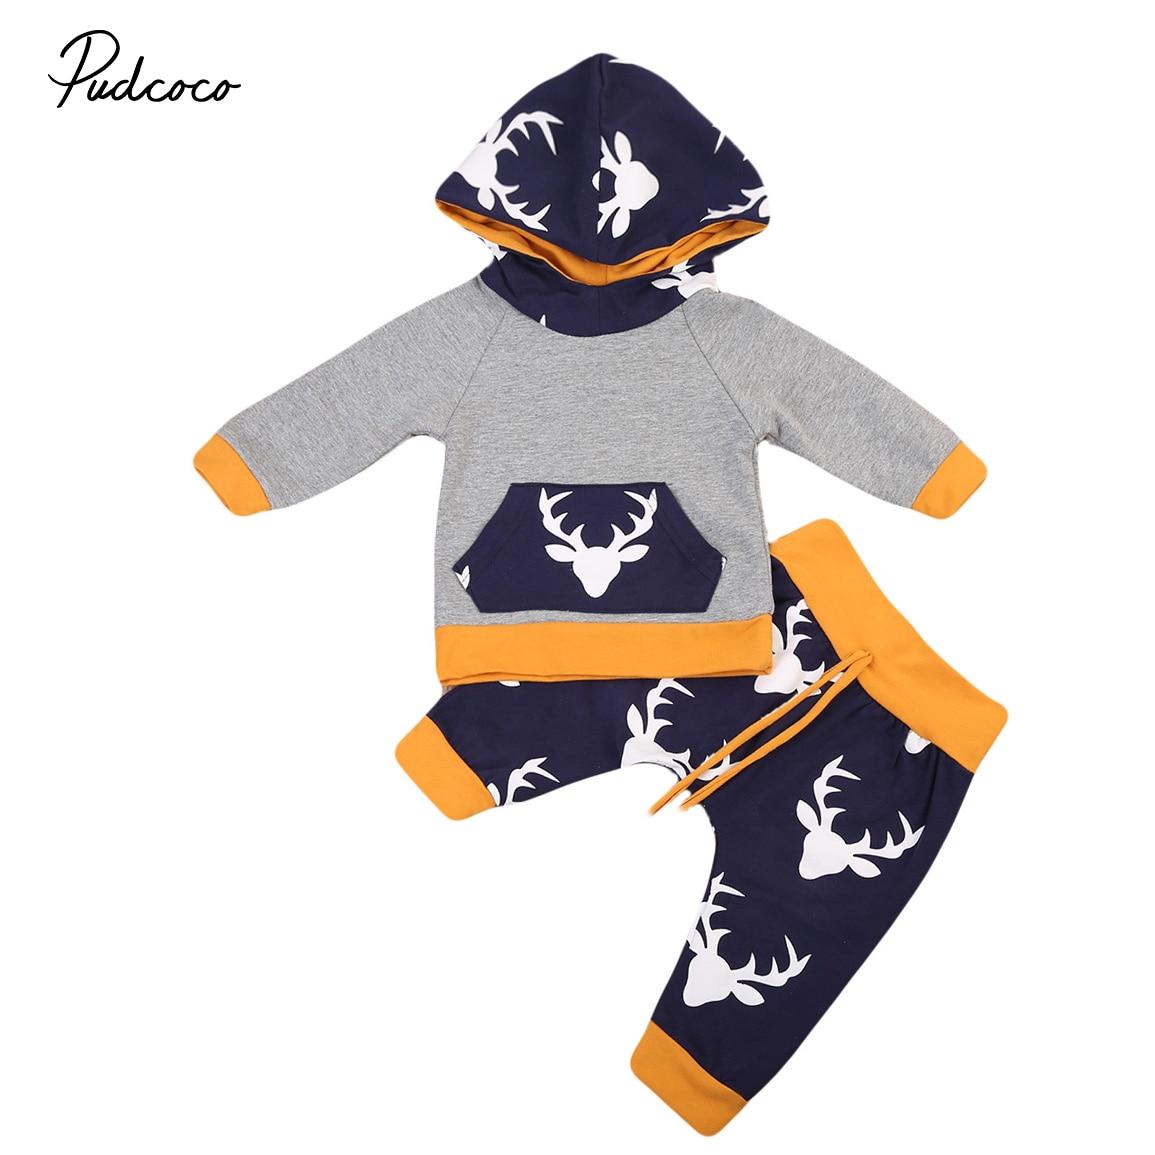 Adorable 2PCS Autumn Winter Newborn Baby Boy Girl Deer Hooded Outfits Warm Cotton Sweater Tops Pants Leggings Clothes Set 2pcs set baby clothes set boy